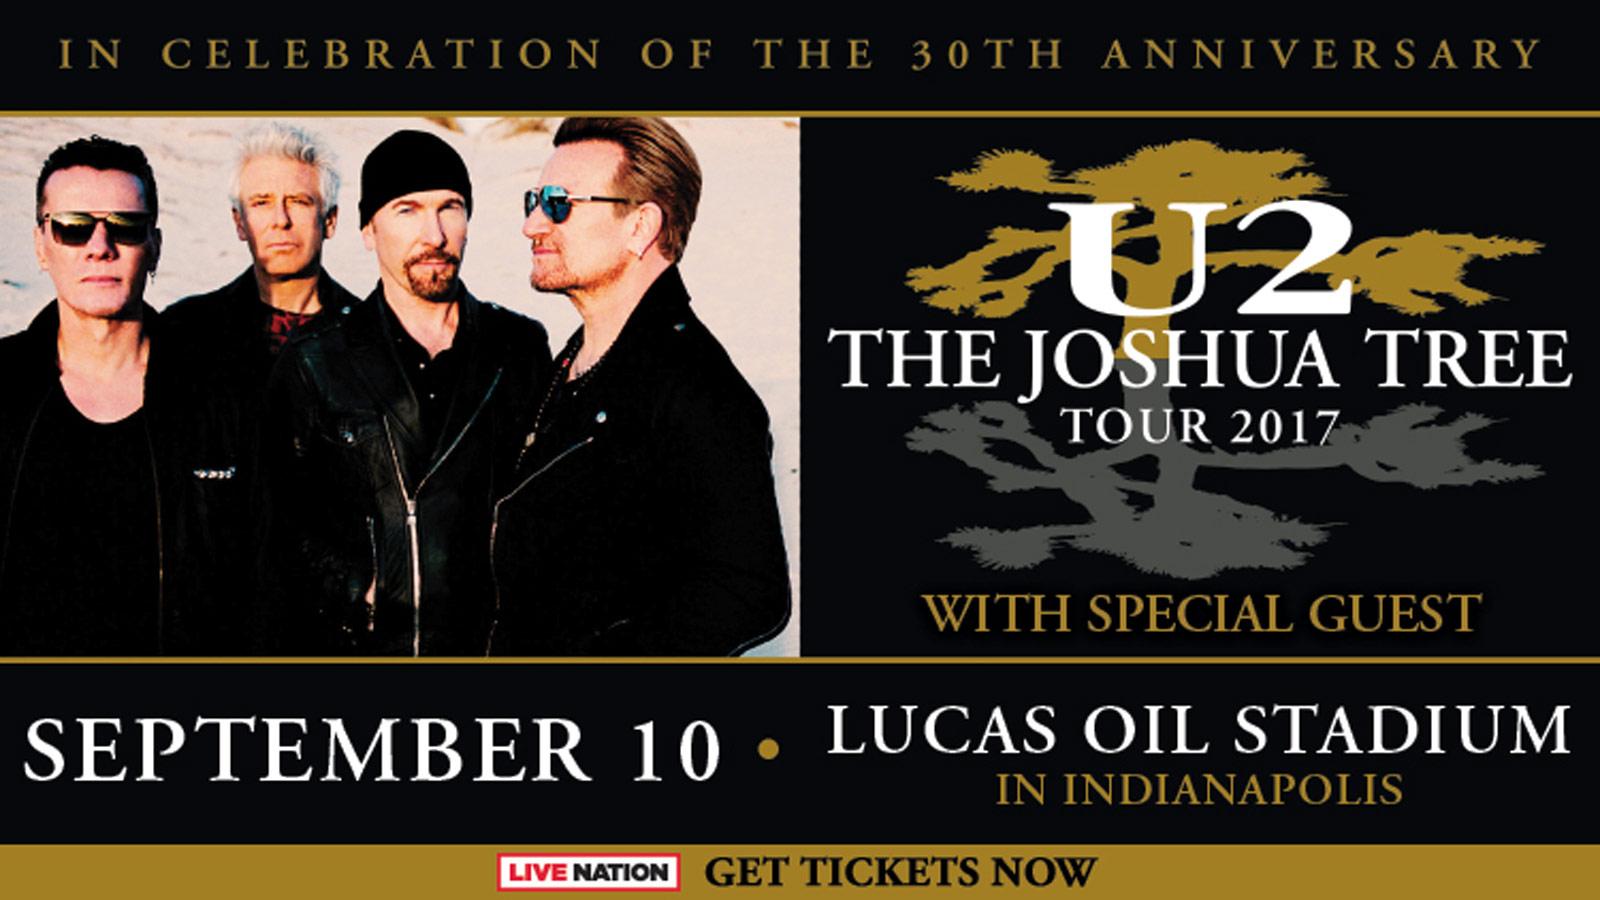 - The Joshua Tree Tour 2020  Lucas Oil Stadium  September 10 U2 Ticket Giveaway Sweepstakes